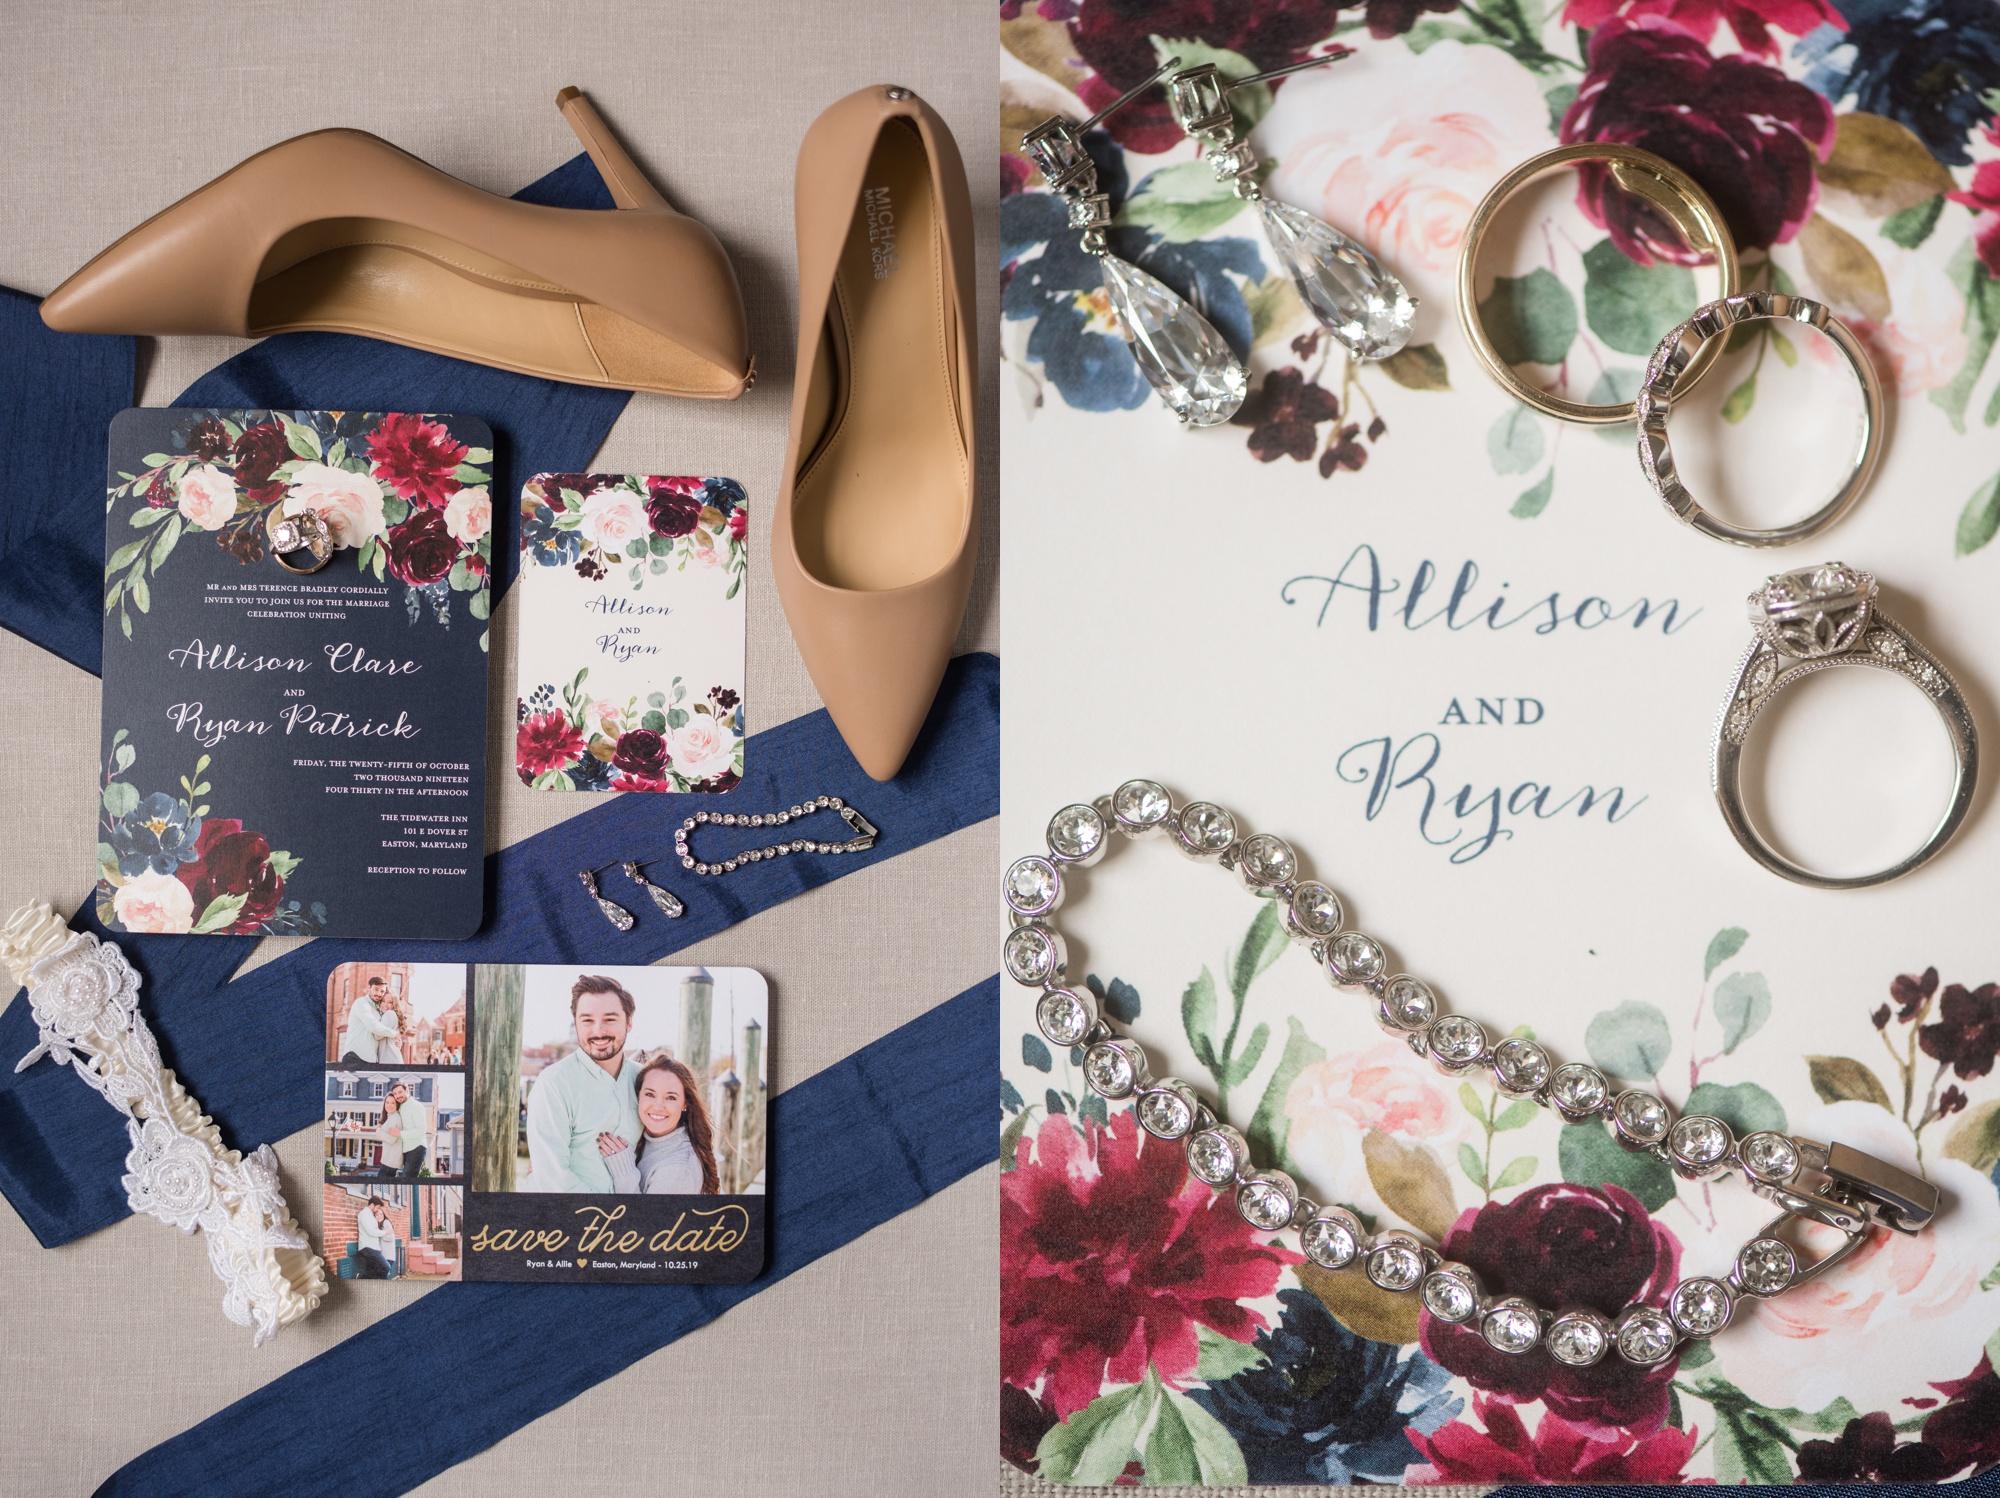 Autumn Tidewater Inn Wedding invitations